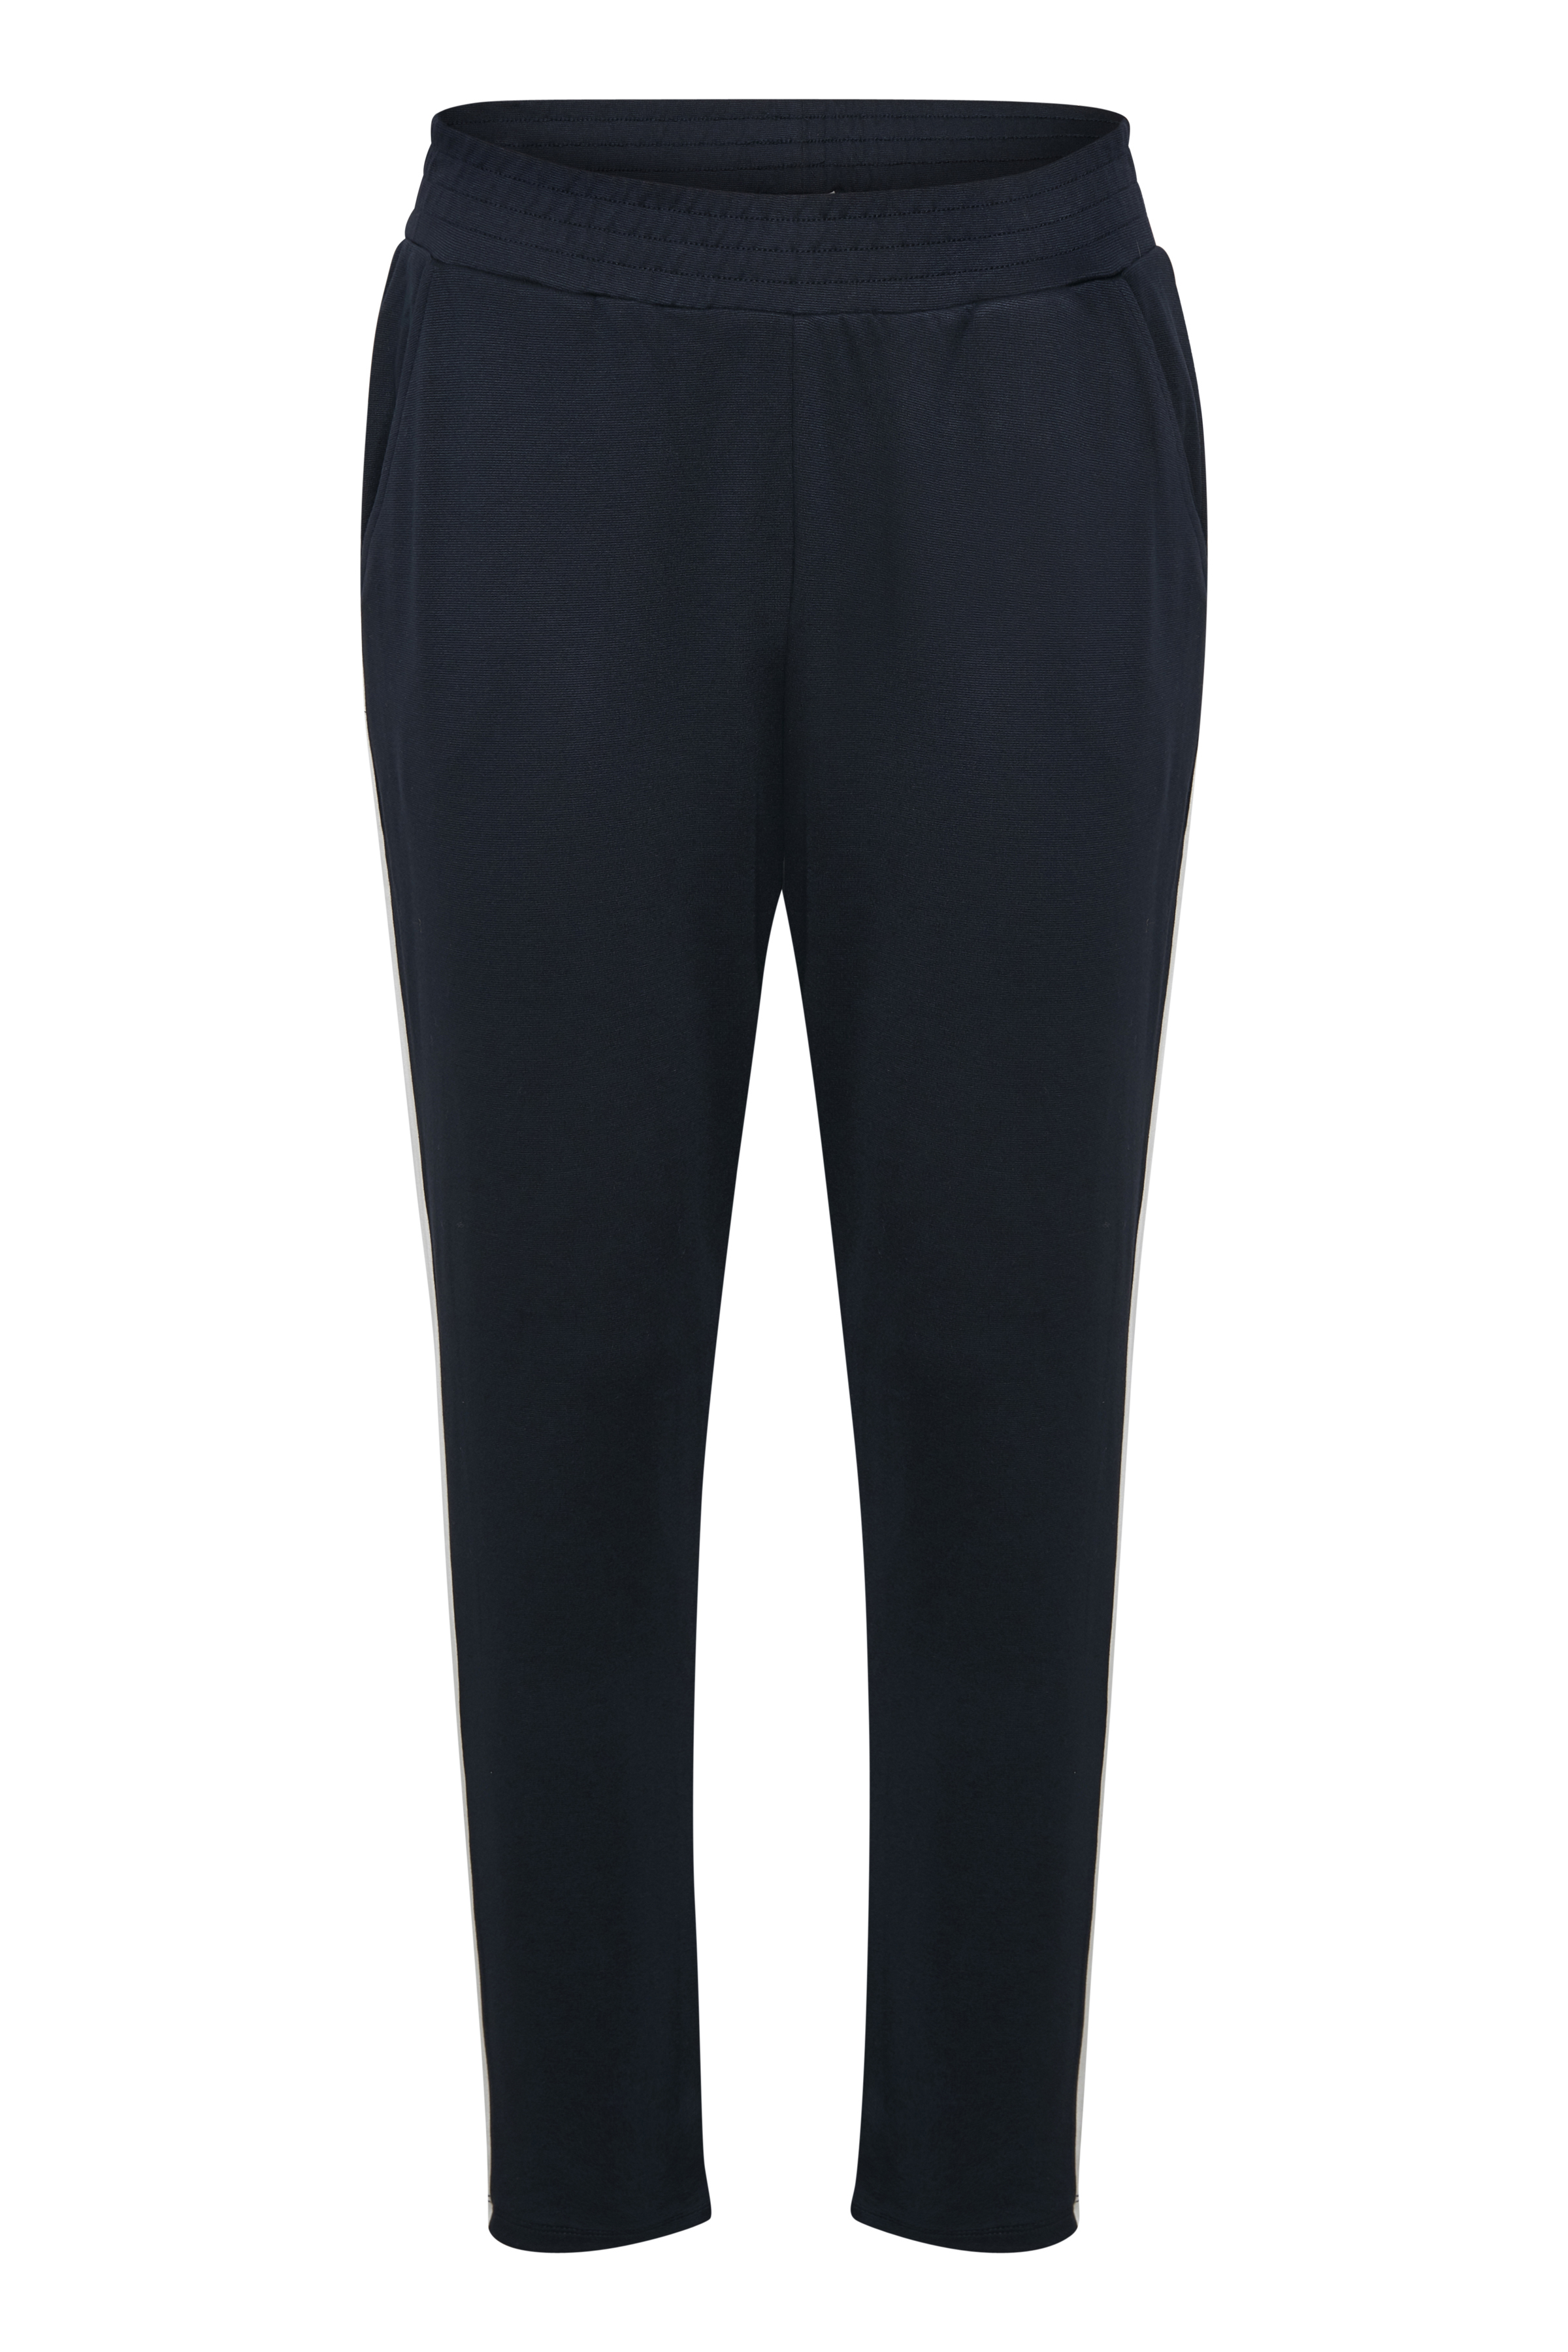 Marineblå Sweatbuks fra Kaffe – Køb Marineblå Sweatbuks fra str. XS-XXL her